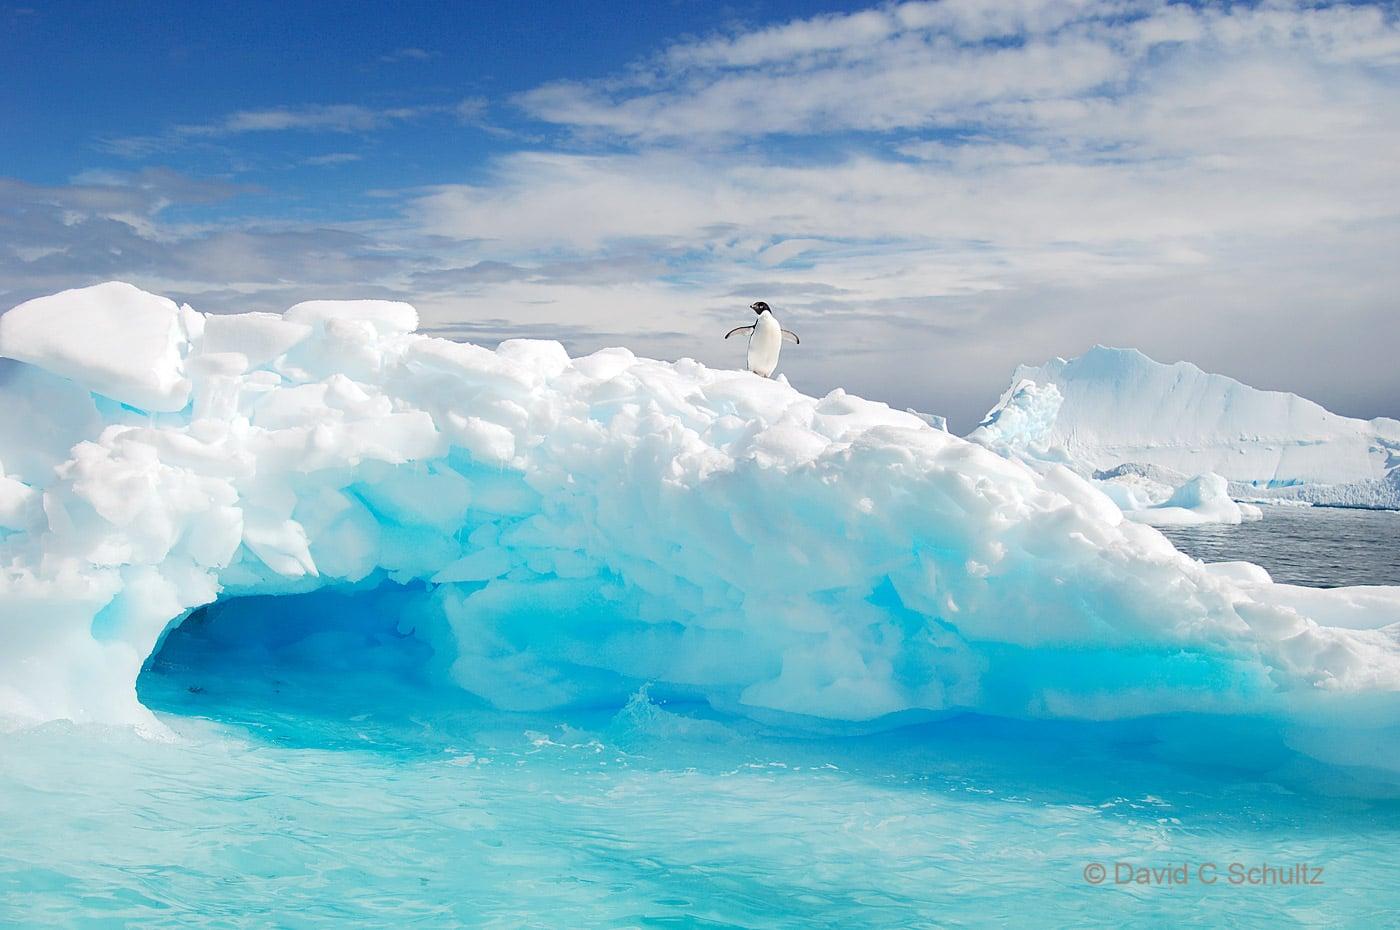 Adelie penguin on an iceberg in Antarctica - Image #163-368